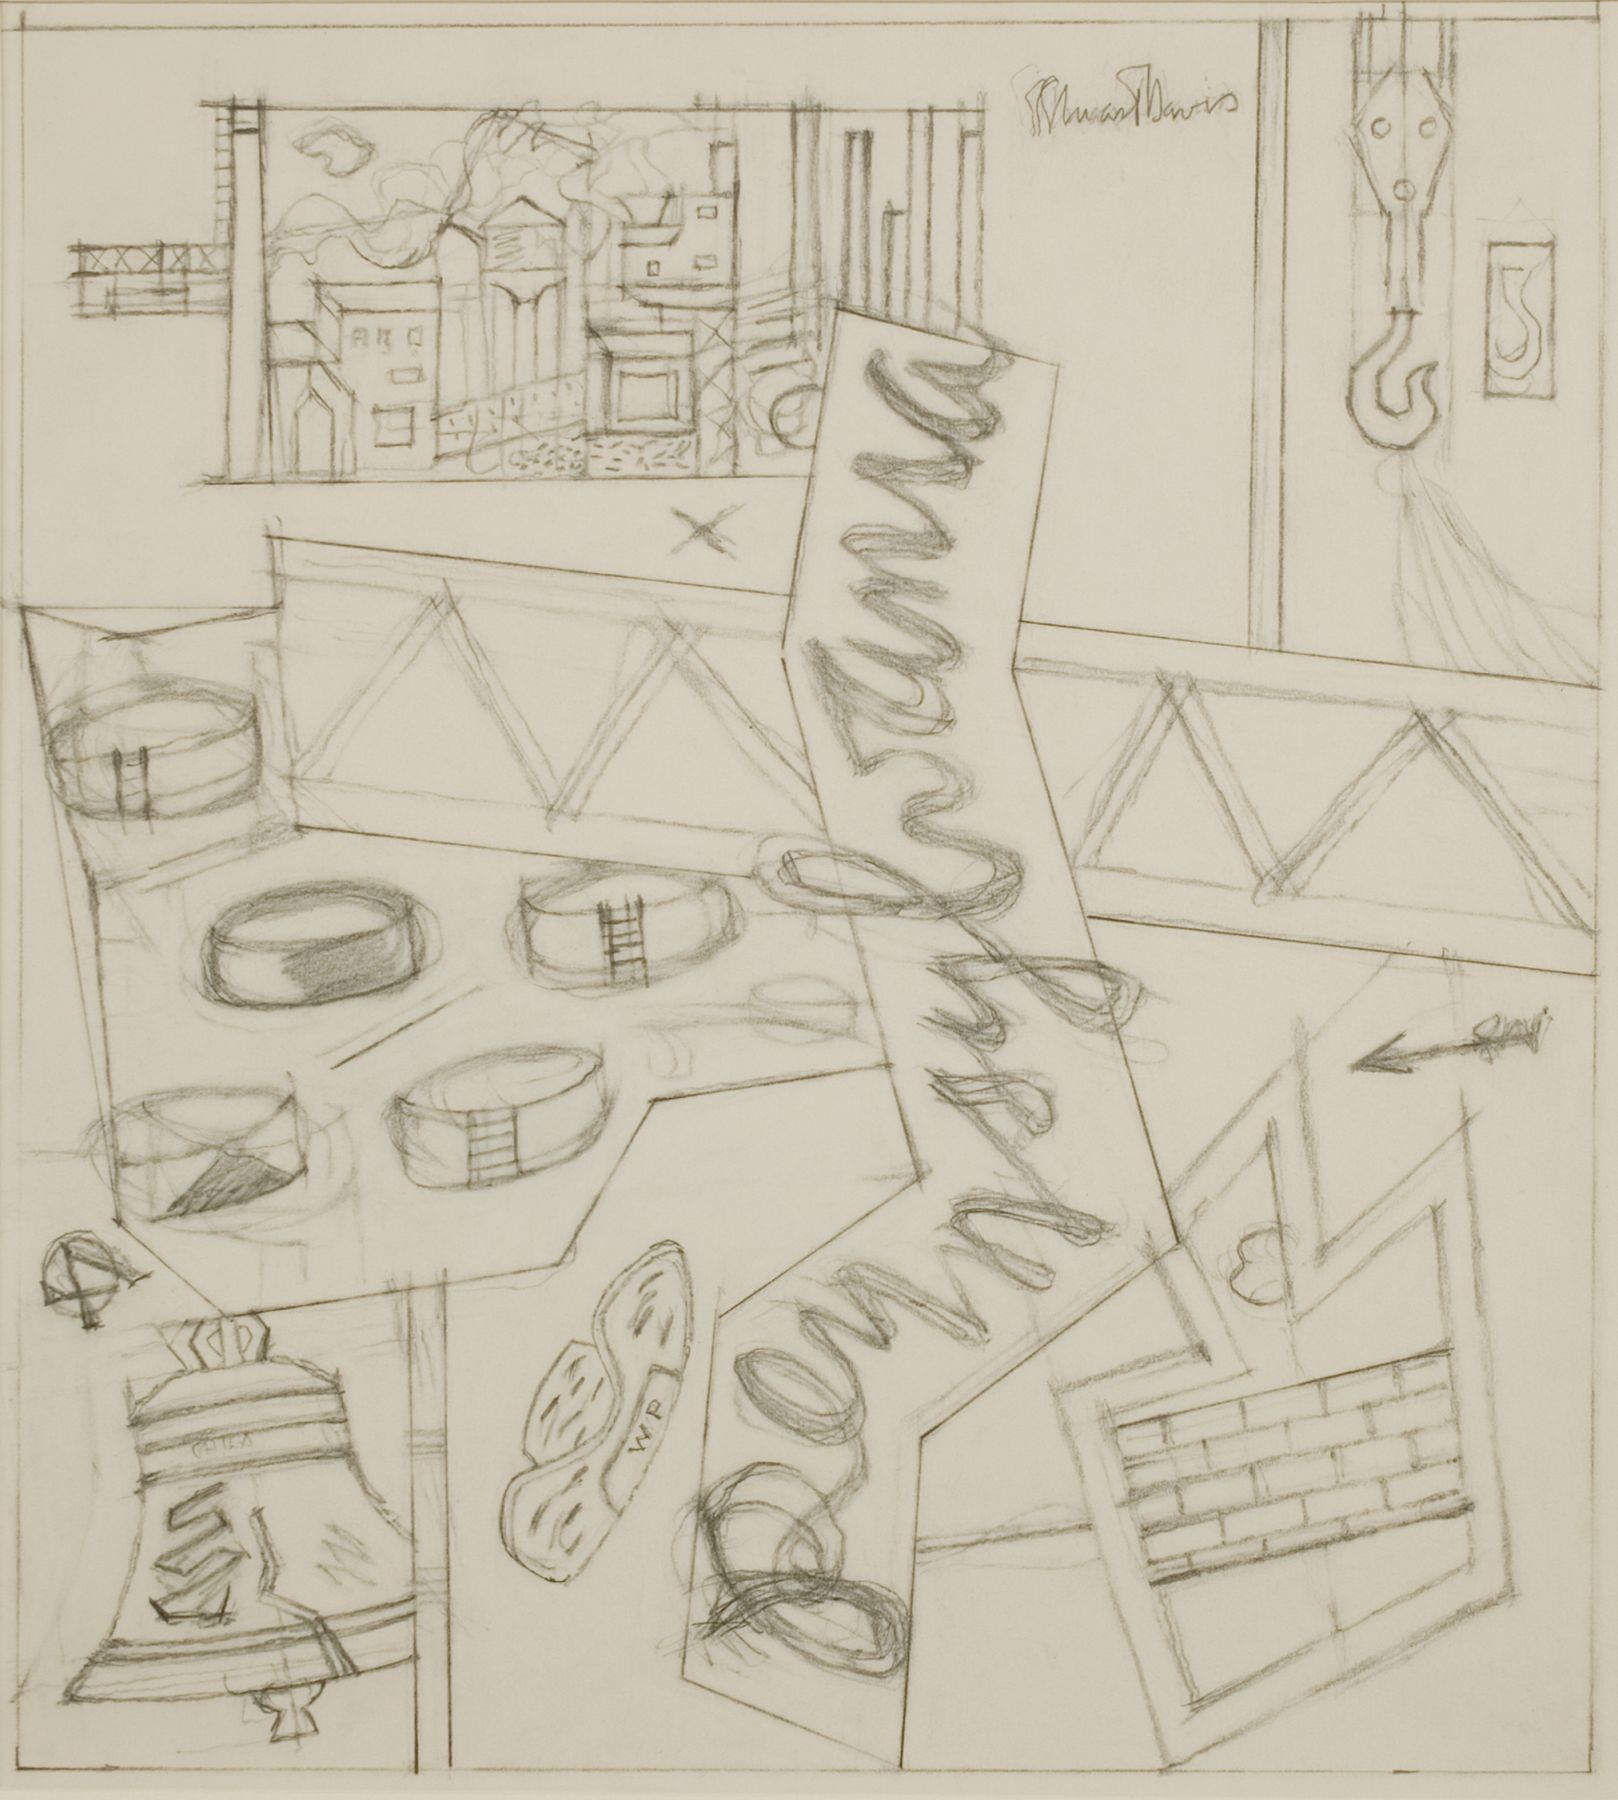 Stuart Davis, Sketchbook 23-1 (Study for 'Pennsylvania'), c. 1946, pencil on paper, 16 3/4 x 13 3/4 inches